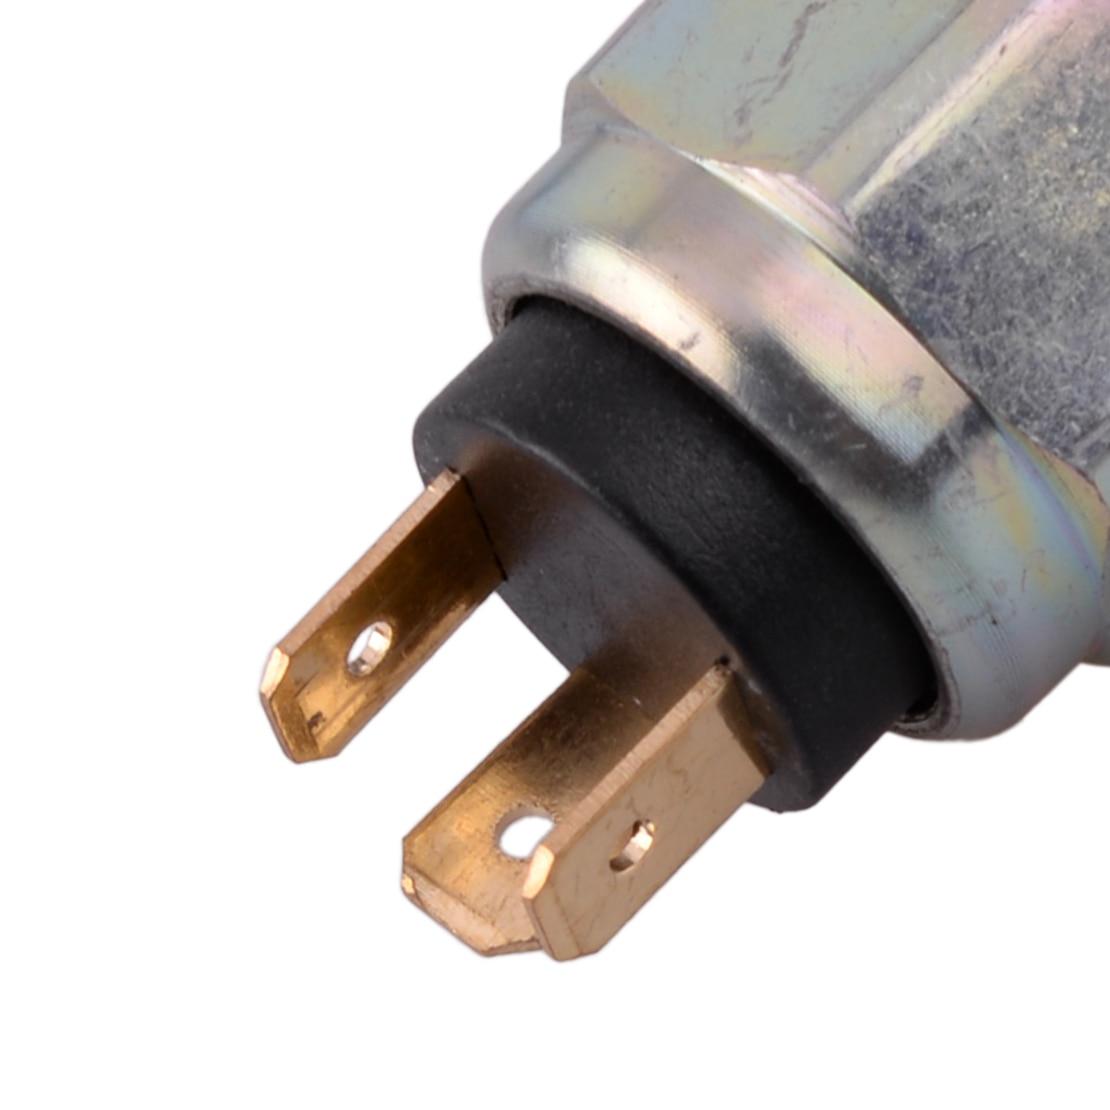 DWCX Car 3 Pins Brake Light Switch 113945515G / SLS-87 / 340038A Fit for VW Bus Beetle Fastback Squareback Thing Transporter